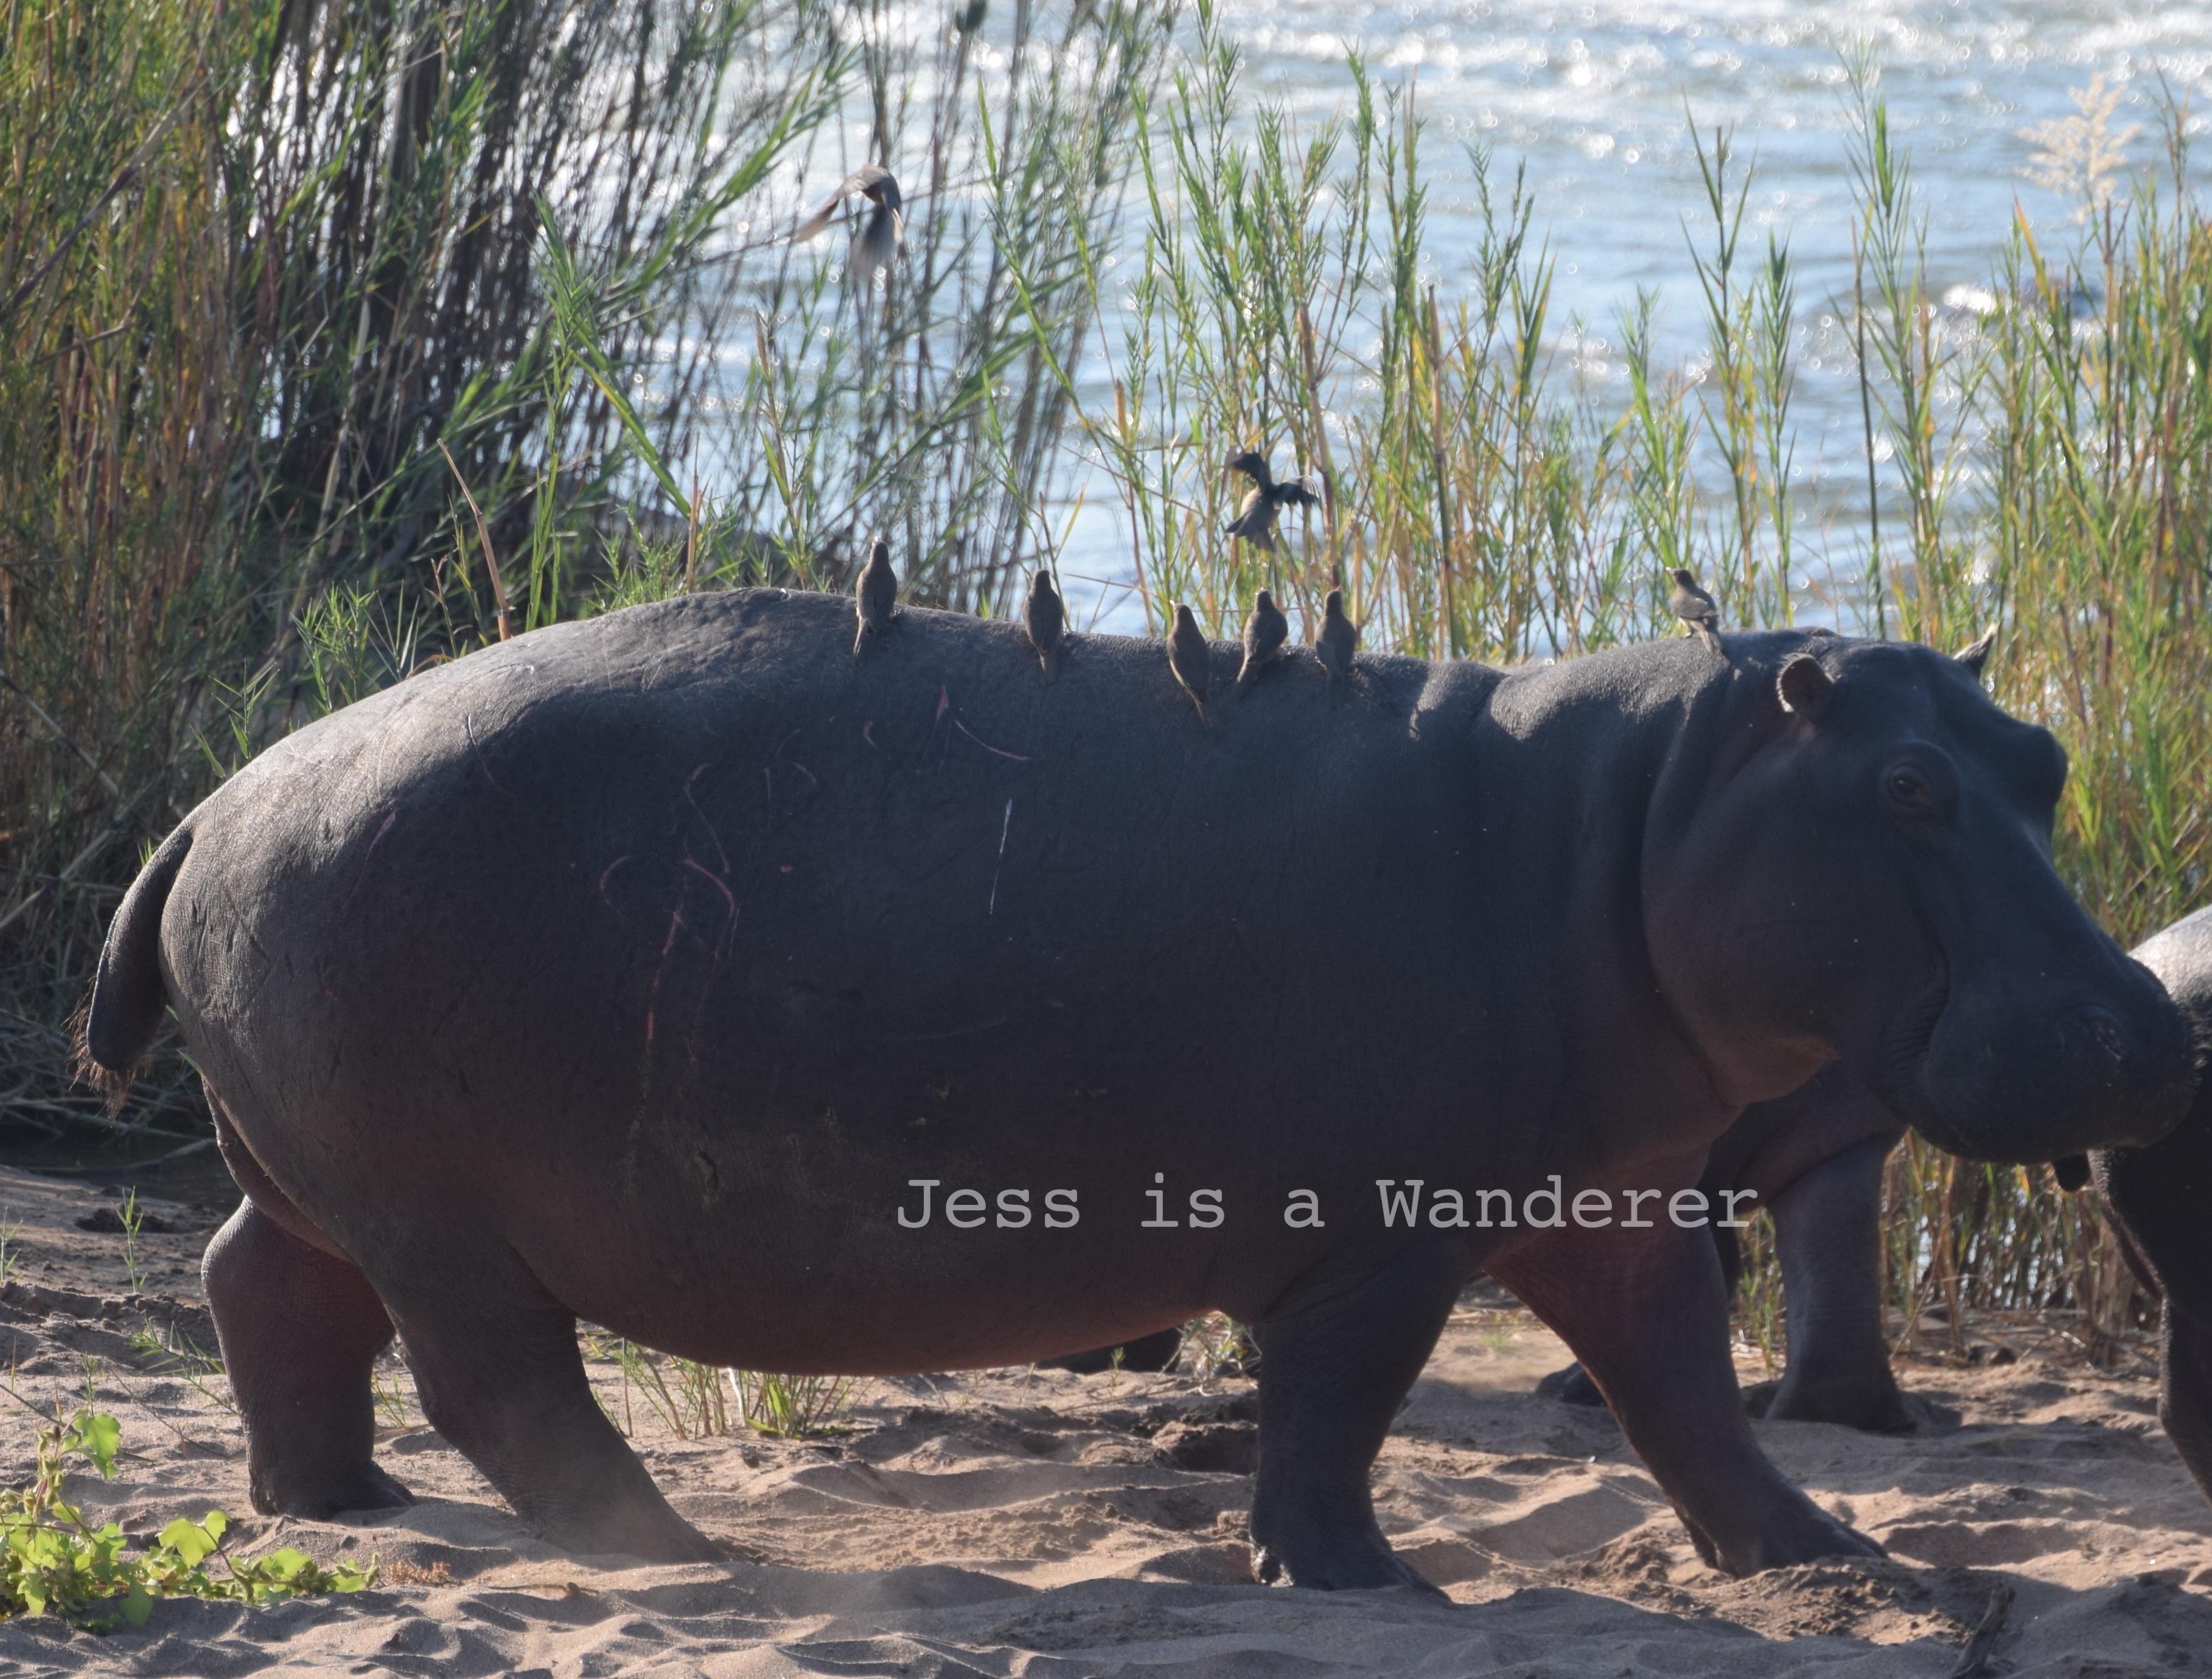 Riding along on a Hippo